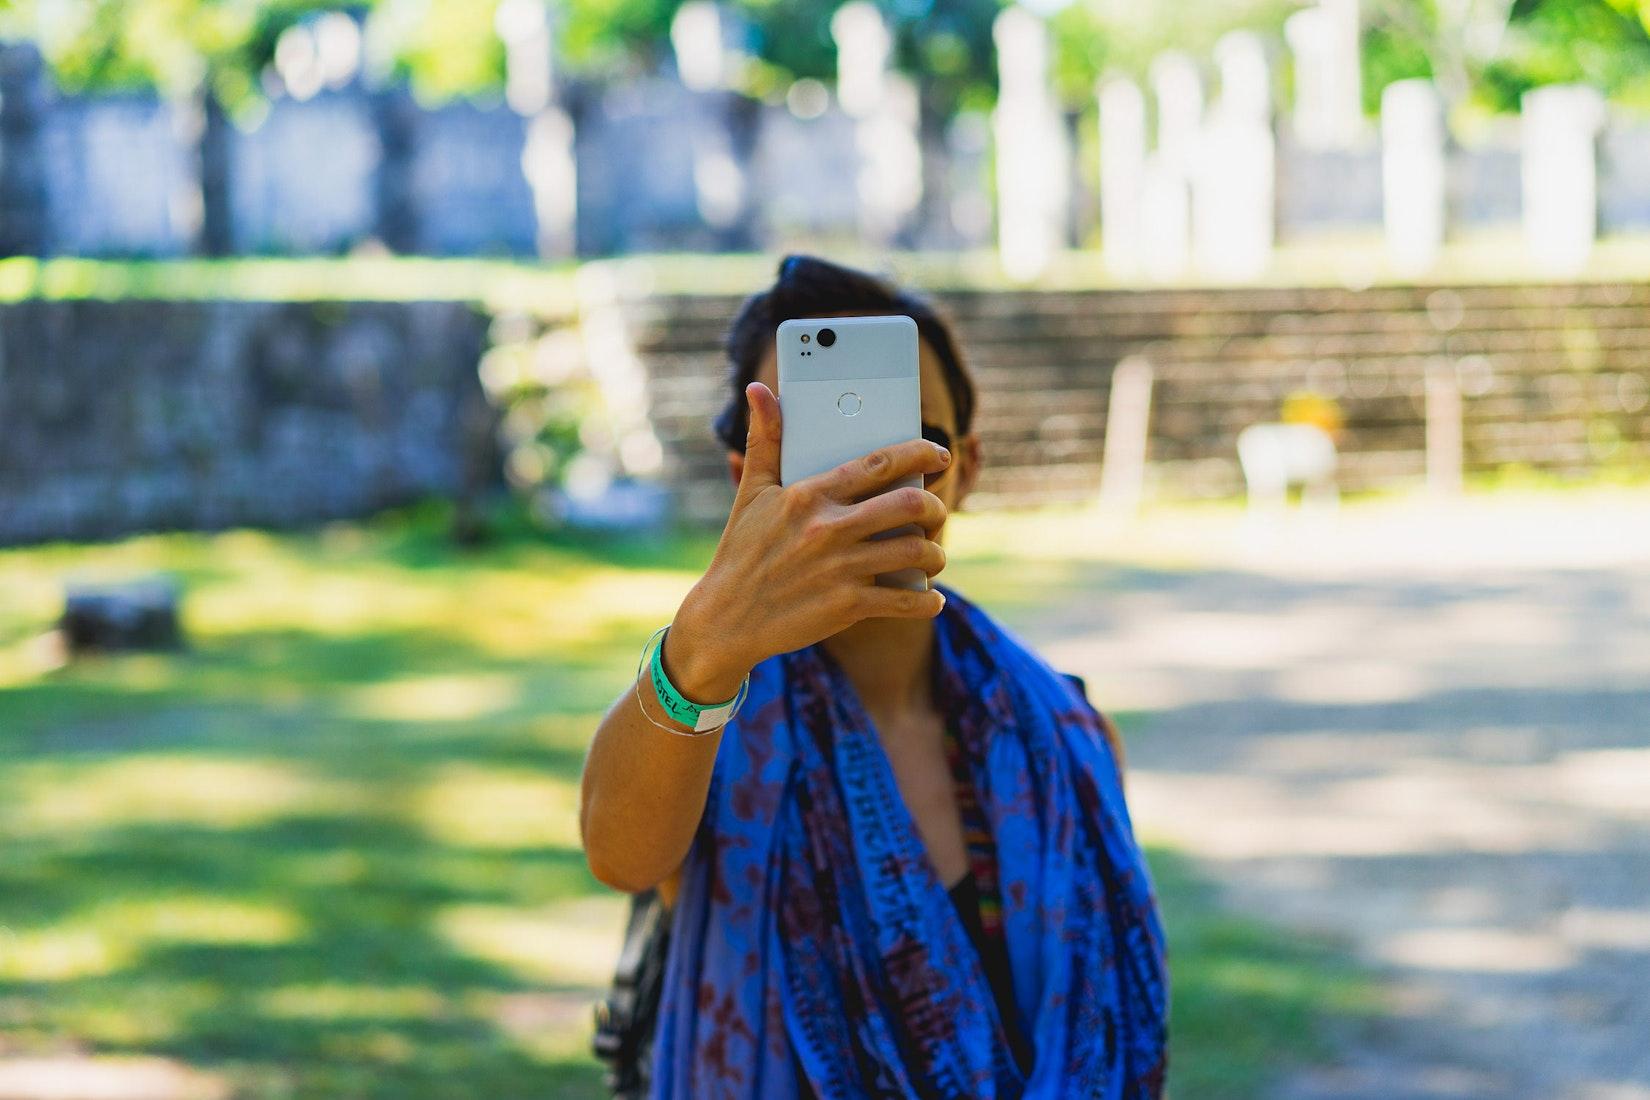 Girl holding a Google Pixel 2 P